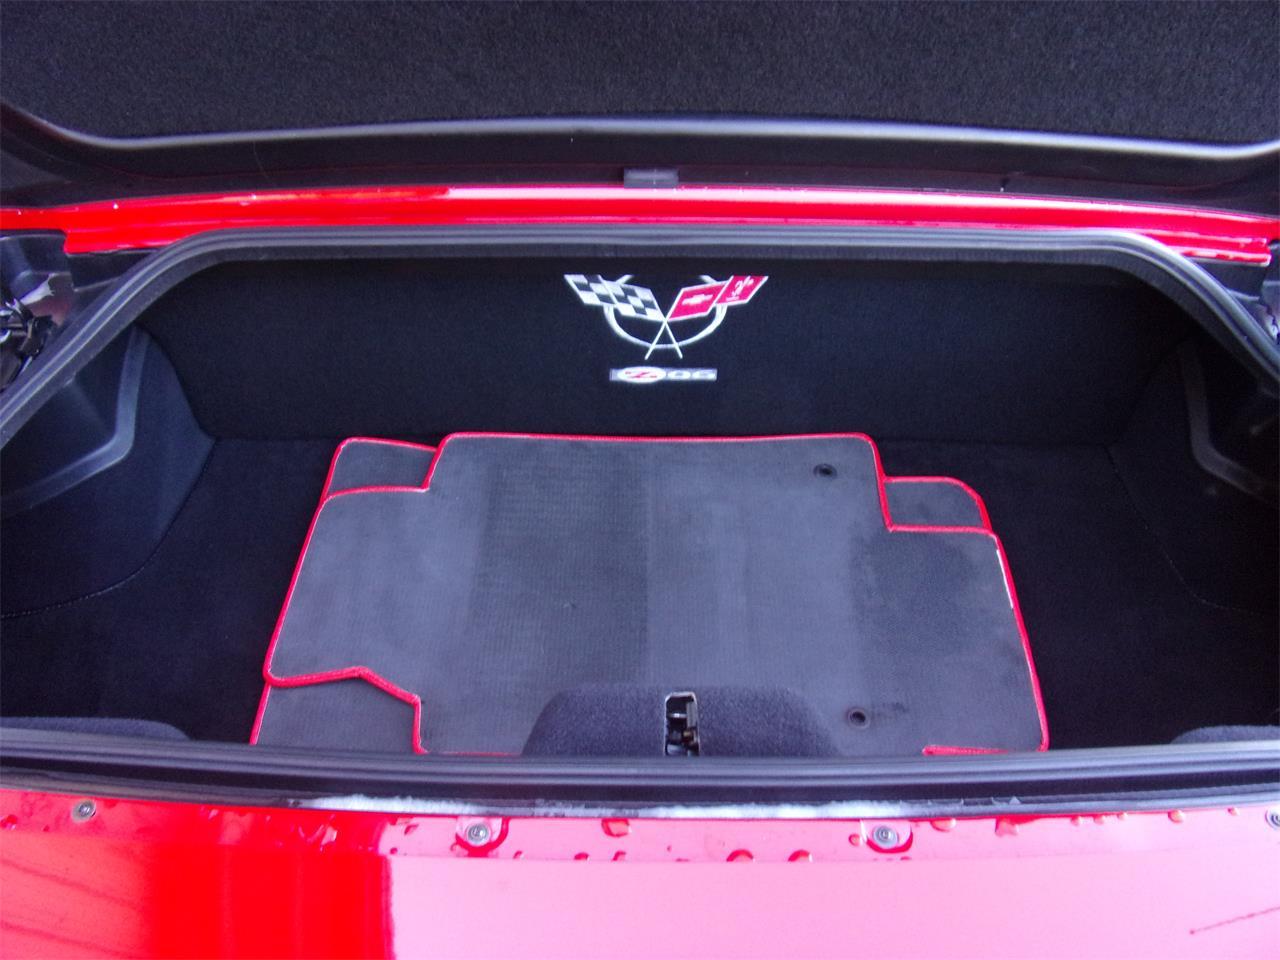 2003 Chevrolet Corvette Z06 (CC-1337138) for sale in Mill Hall, Pa.